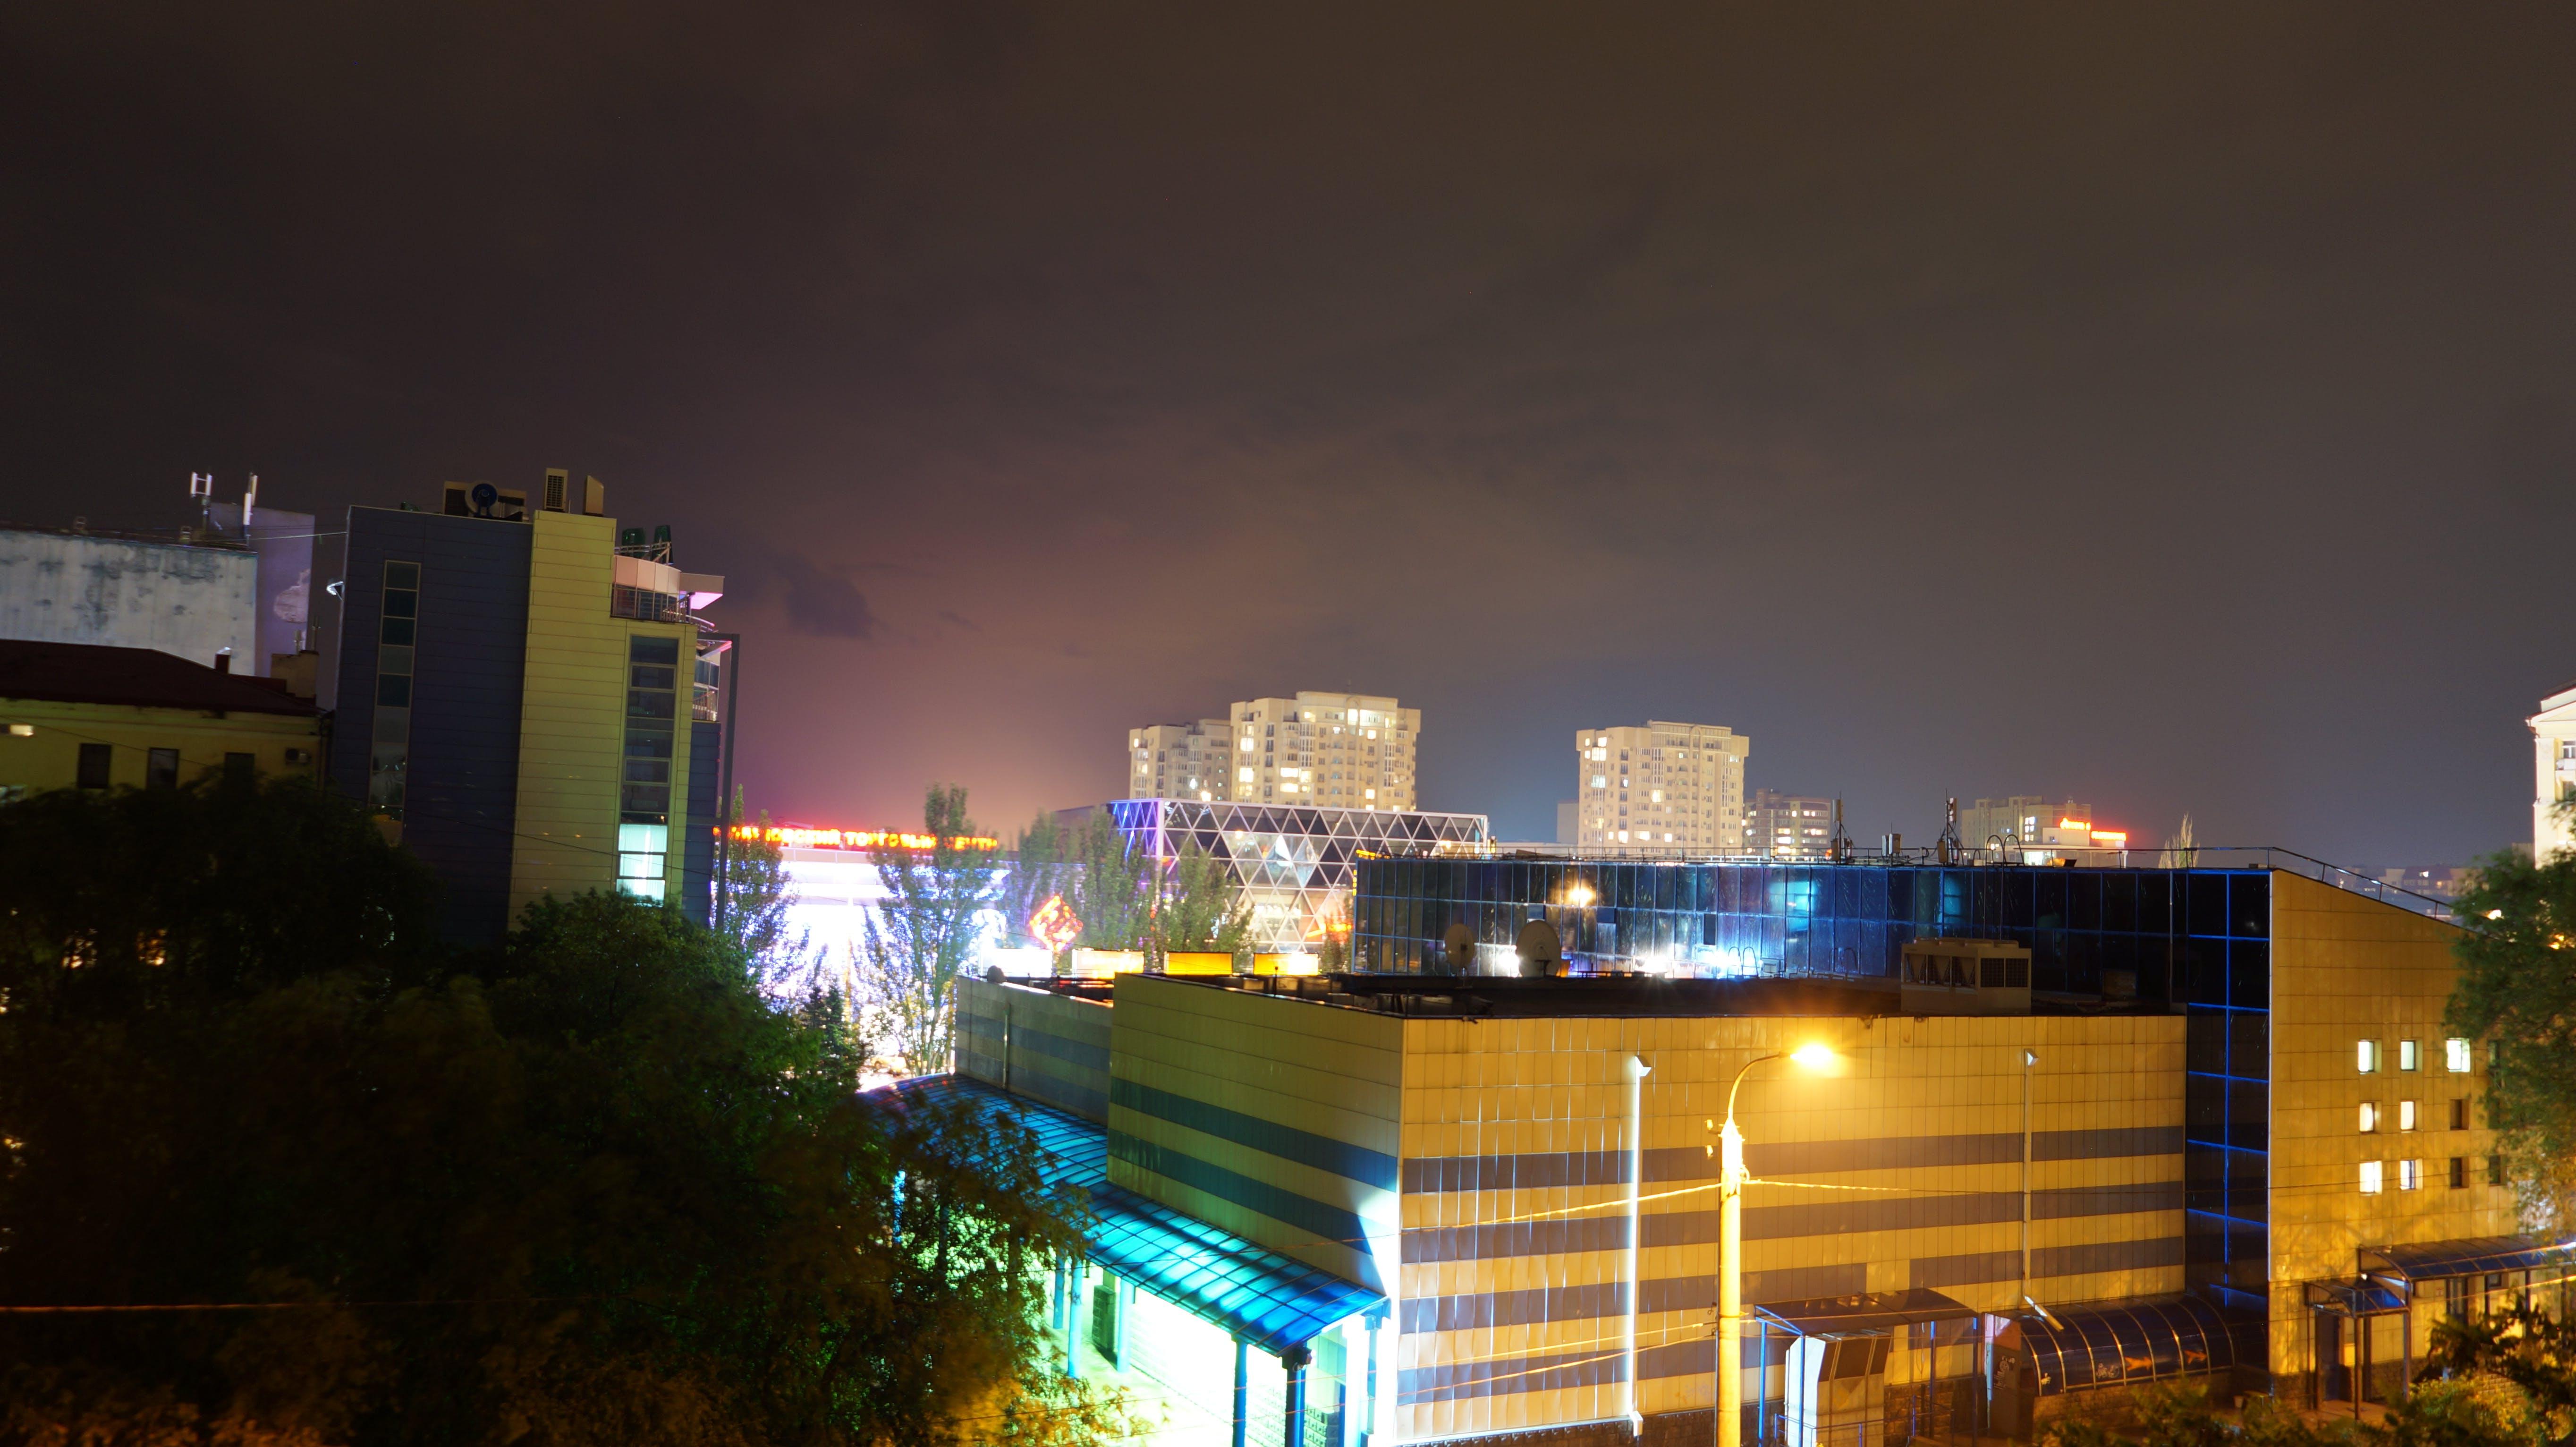 Free stock photo of city, lights, night, cloudy